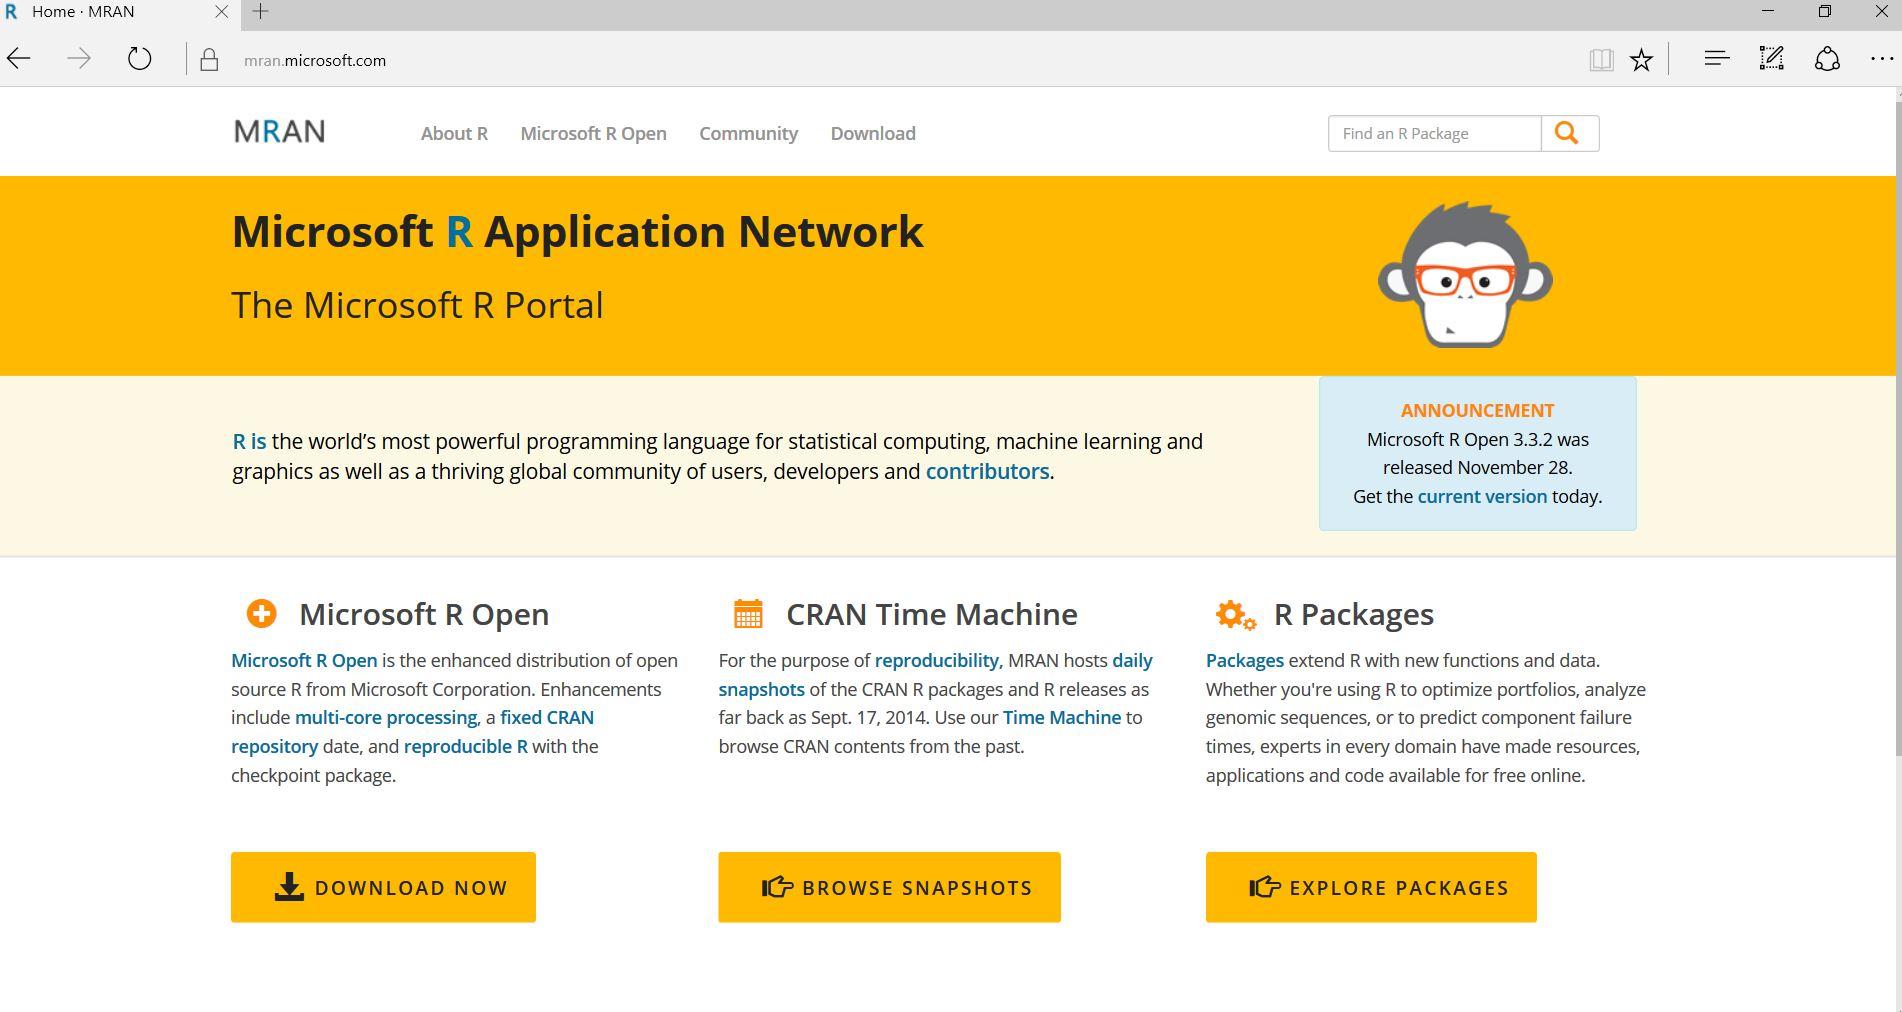 MRAN website